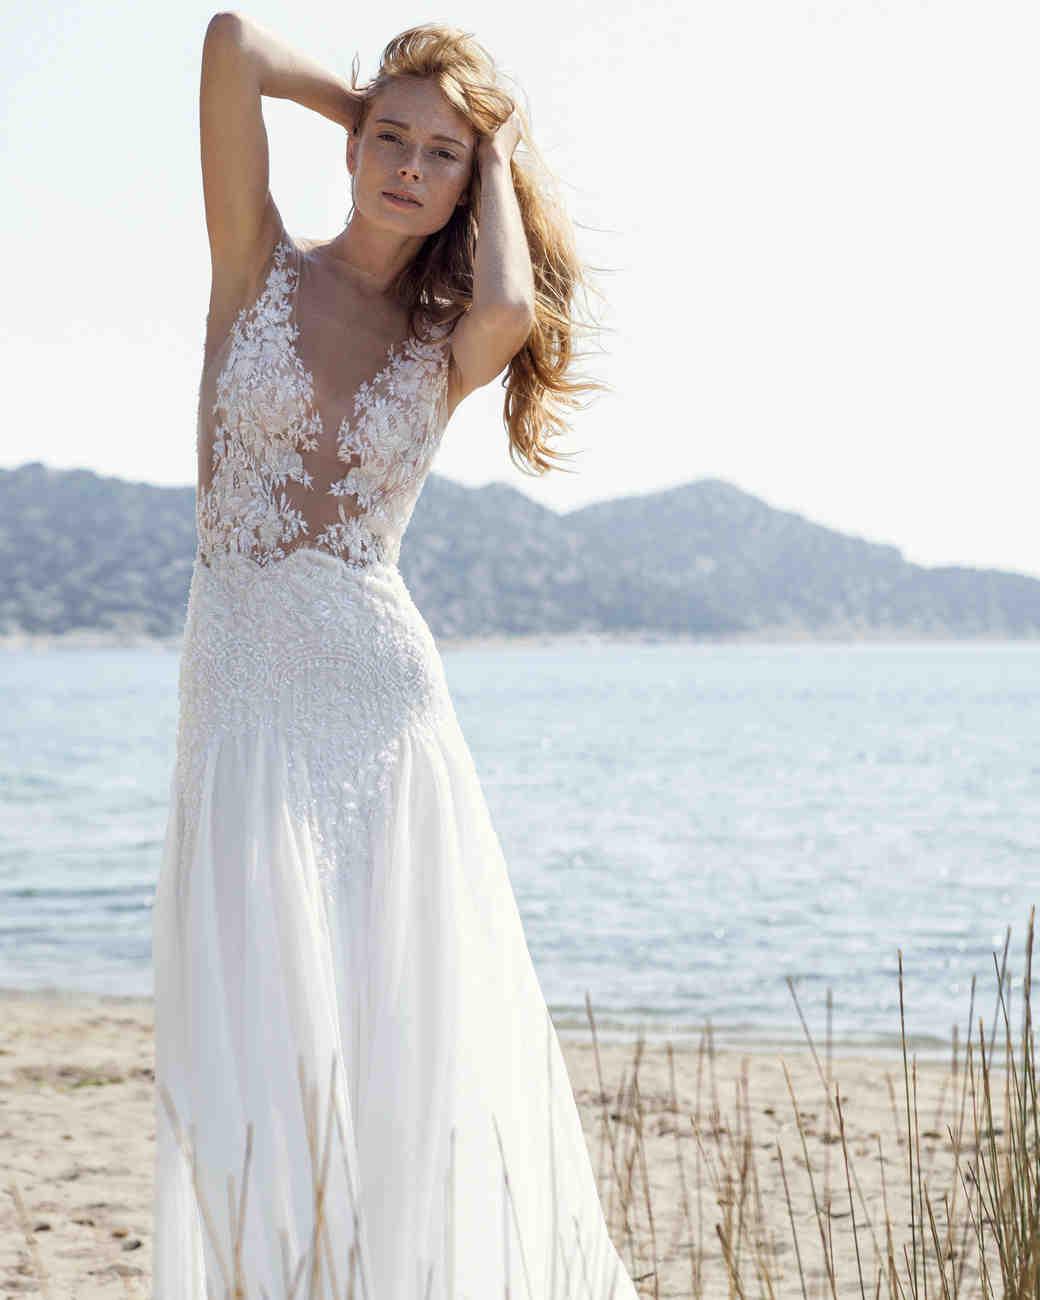 costarellos-fall2016-wedding-dress-16-48.jpg